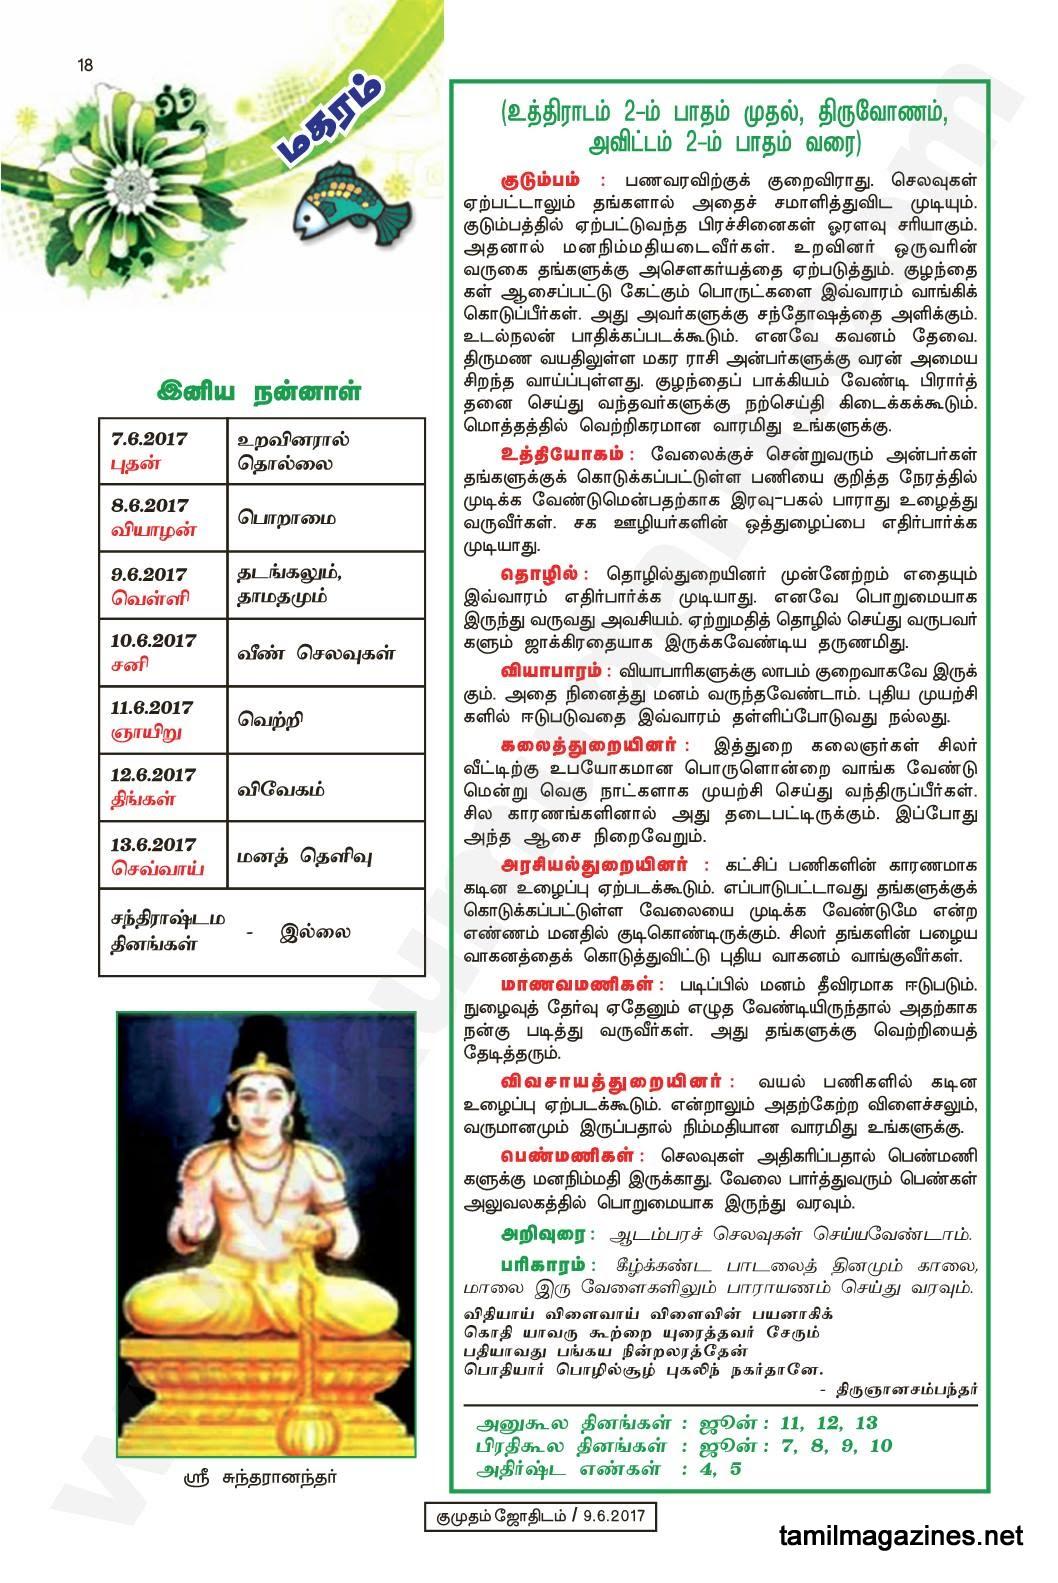 Kumudam Jothidam Raasi Palan June 7 to June 13, 2017